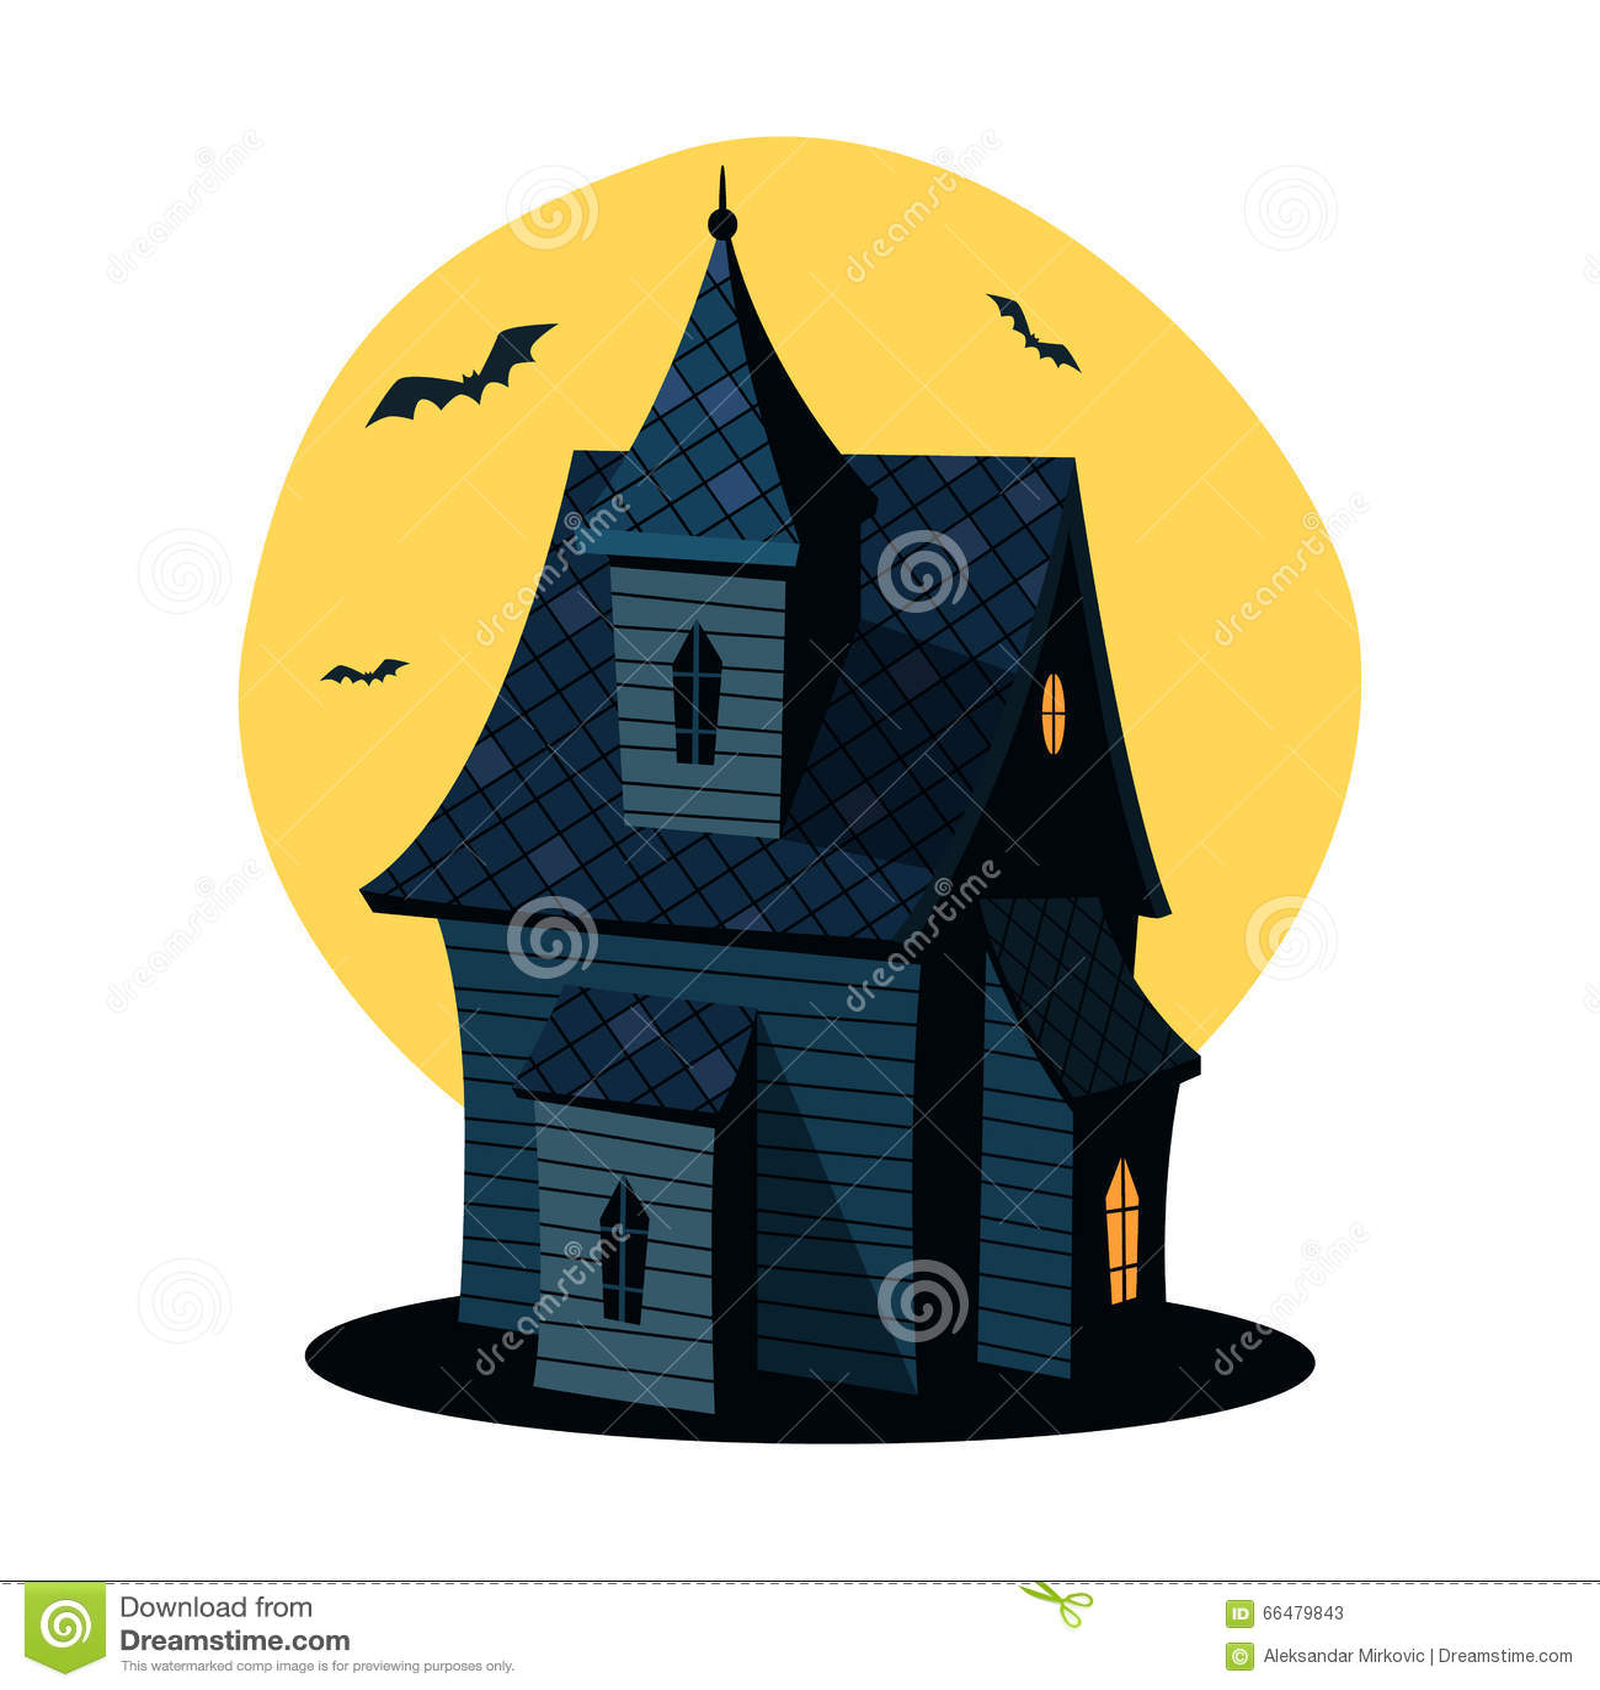 Cartoon haunted house stock vector illustration of - Cartoon haunted house pics ...